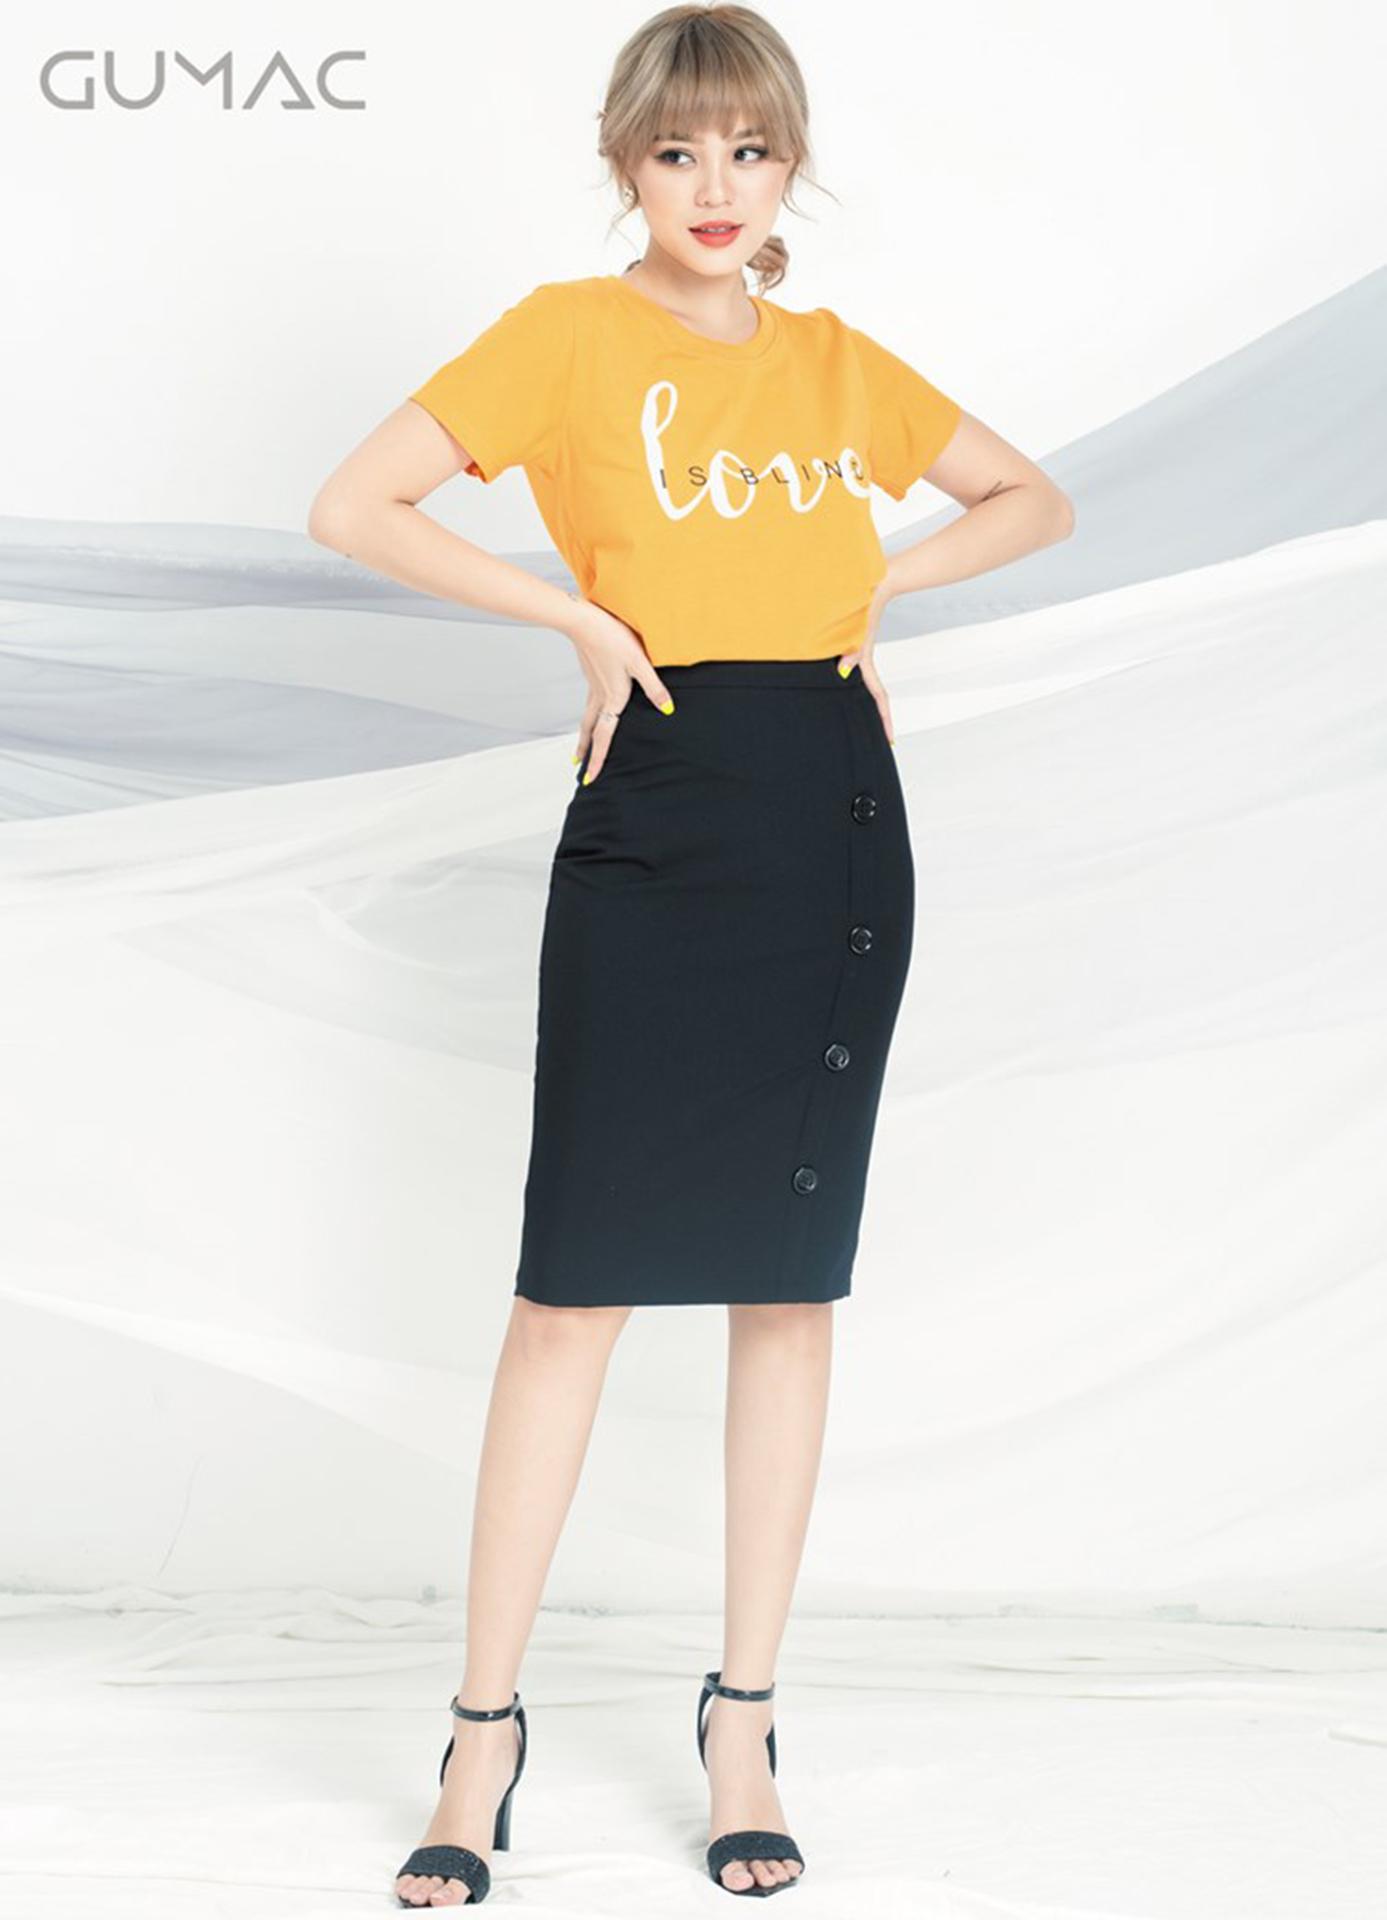 Free Images Clothing Pencil Skirt Yellow Waist Fashion